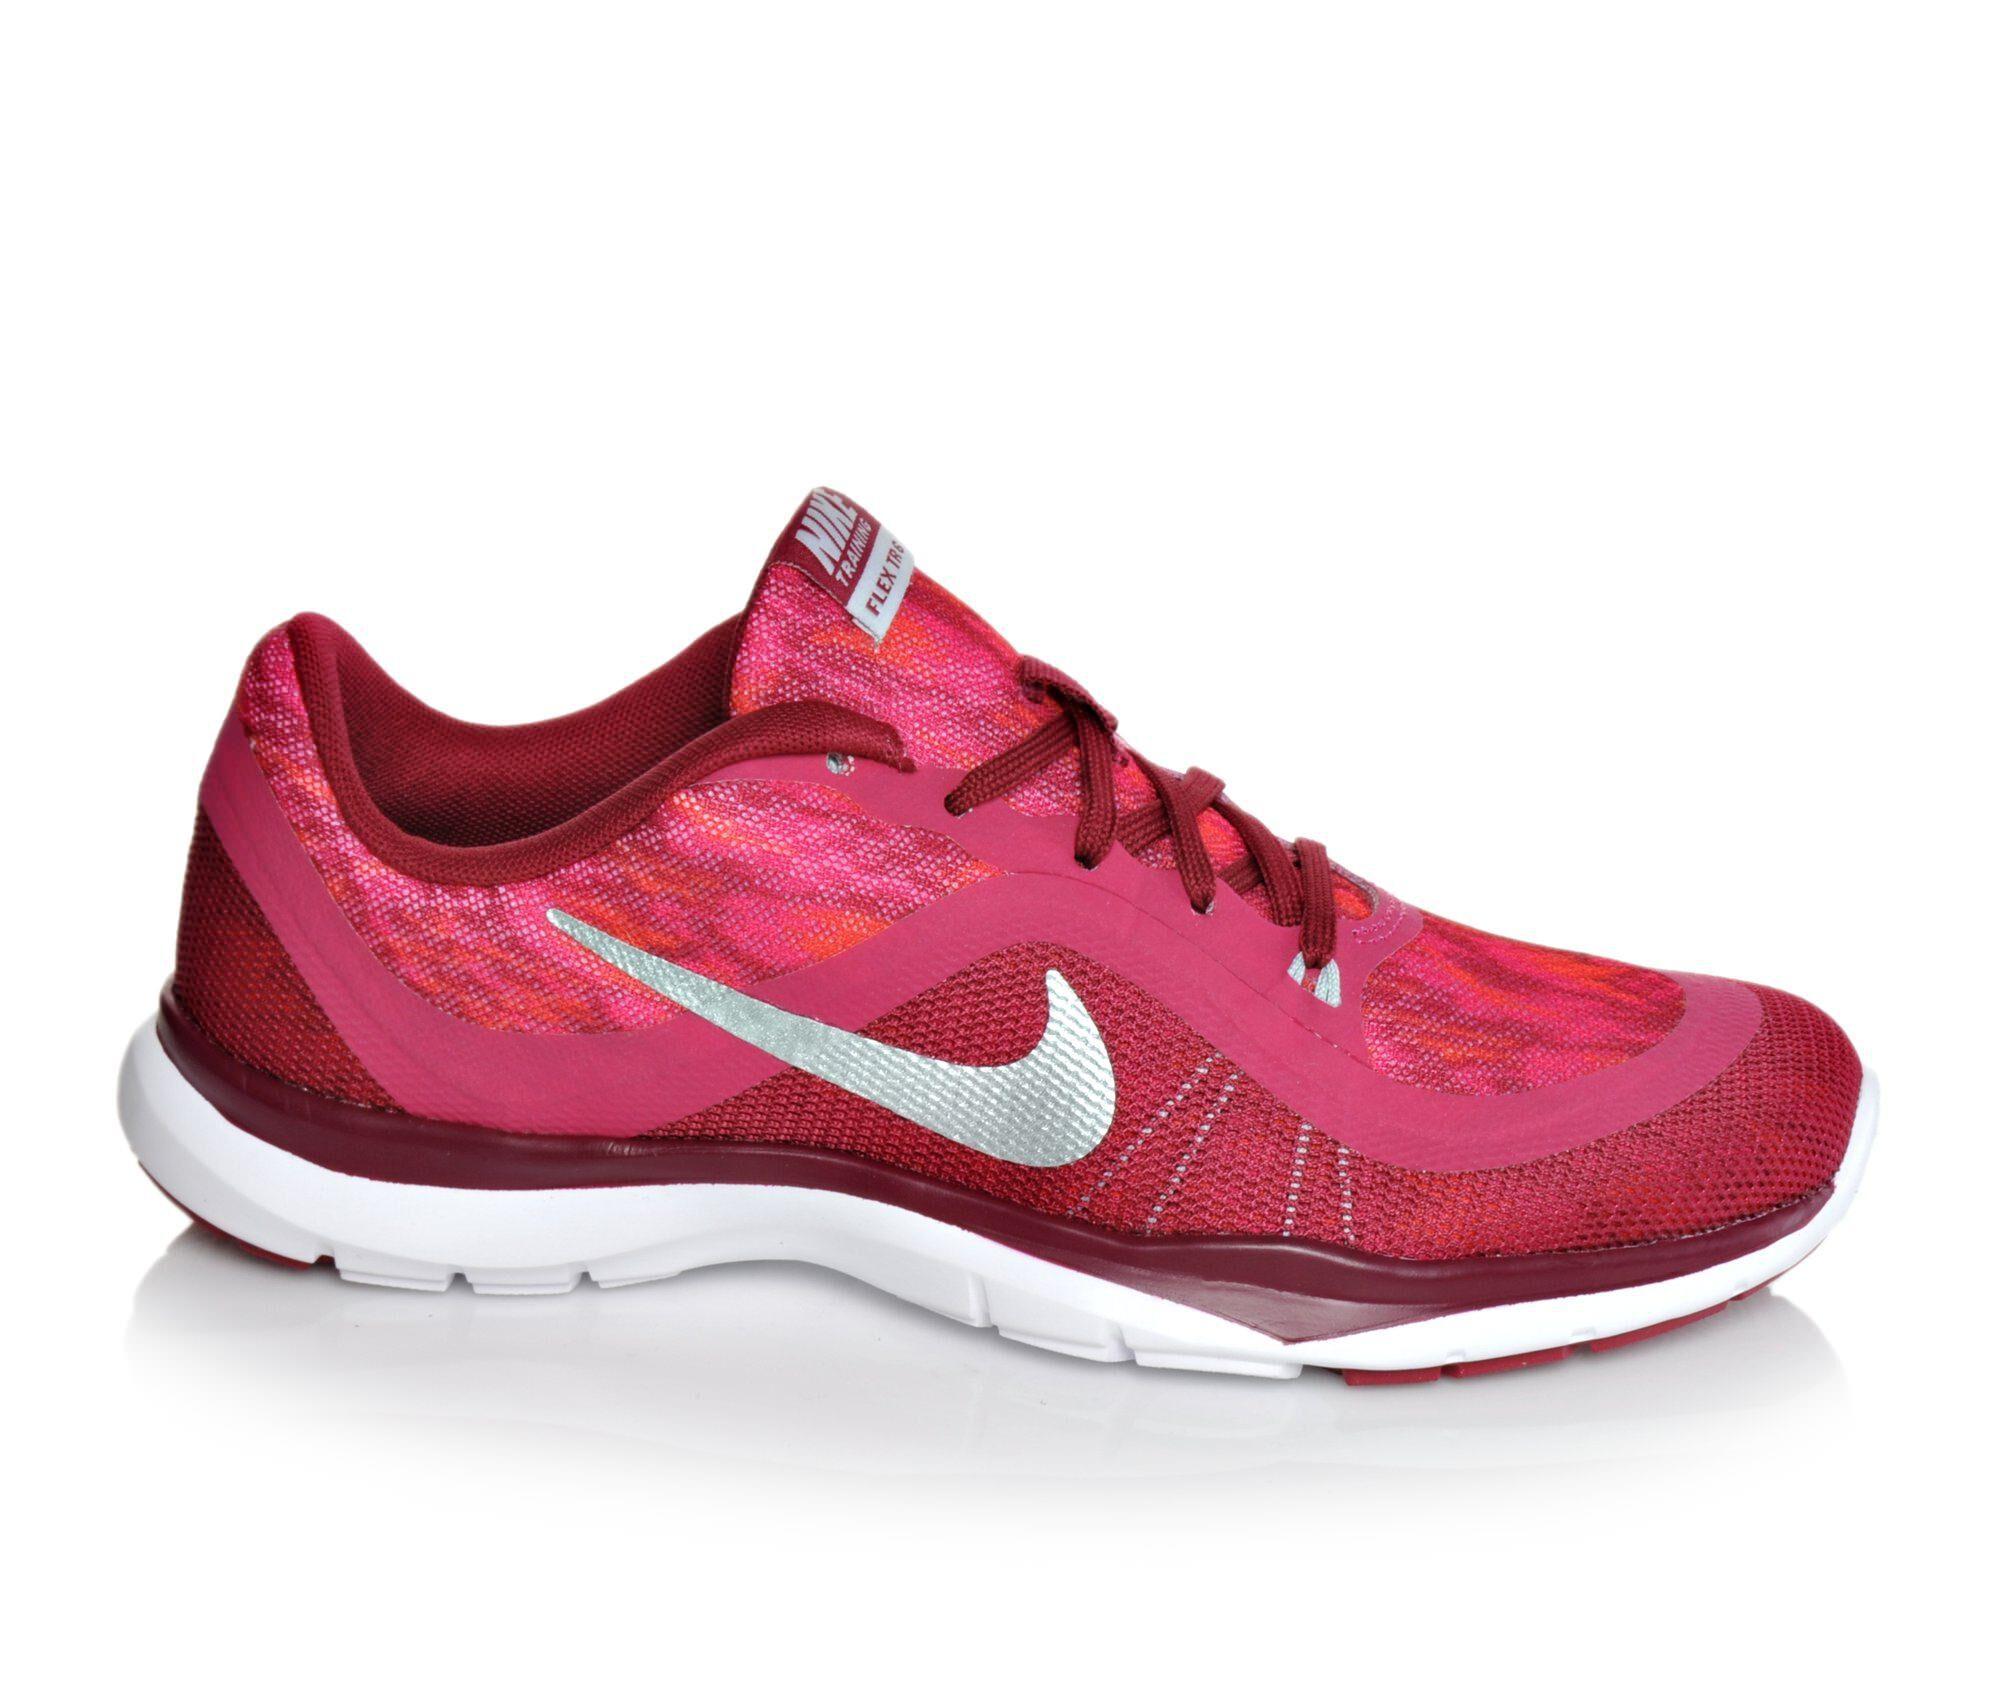 f2bdfb5c3b75a ... ebay womens nike flex trainer 6 print training shoes shoe carnival  9403e 686d6